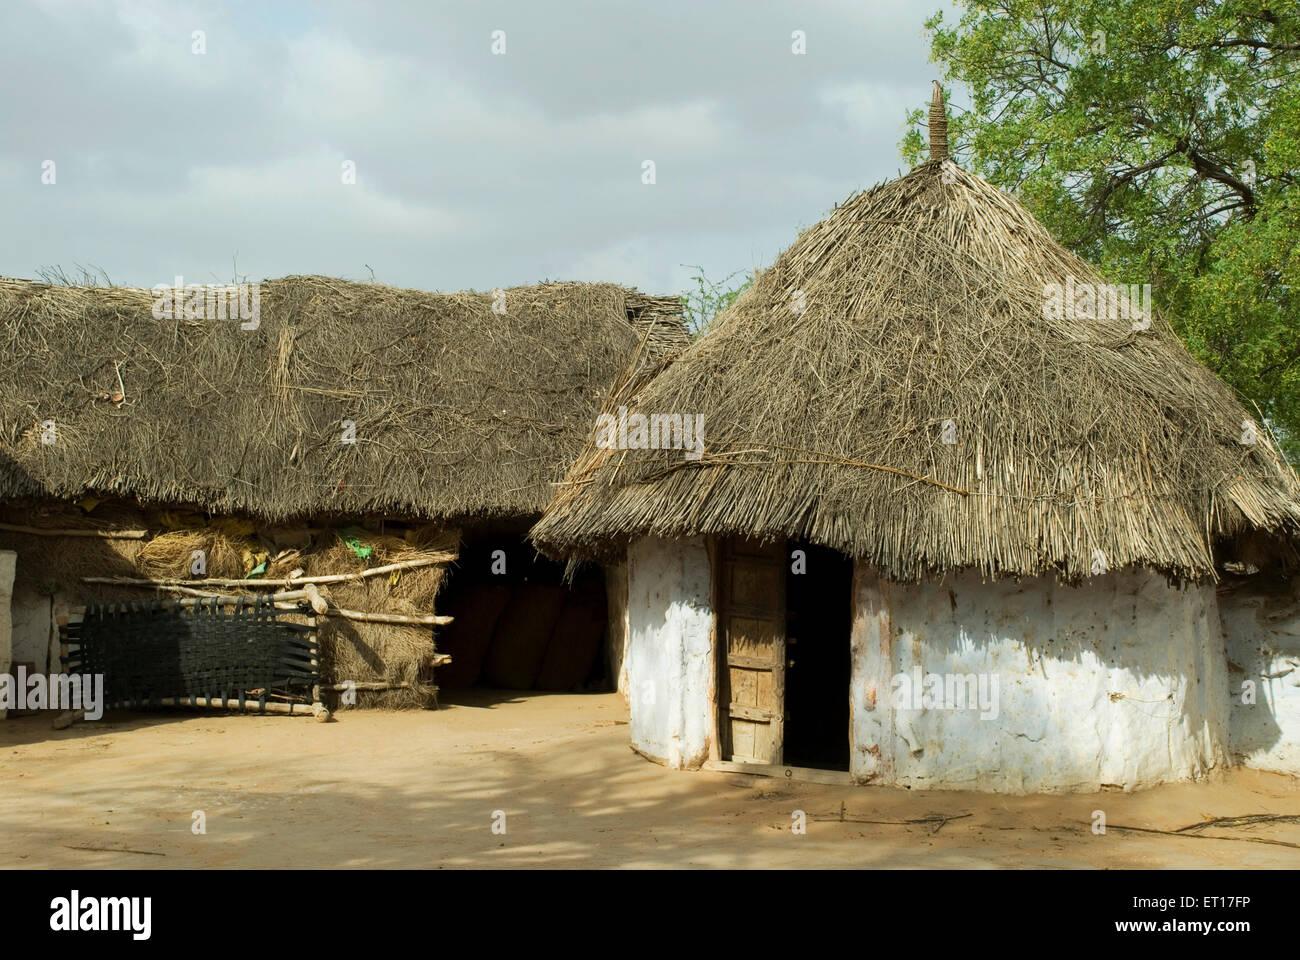 Mud hut tivary jodhpur rajasthan india stock image